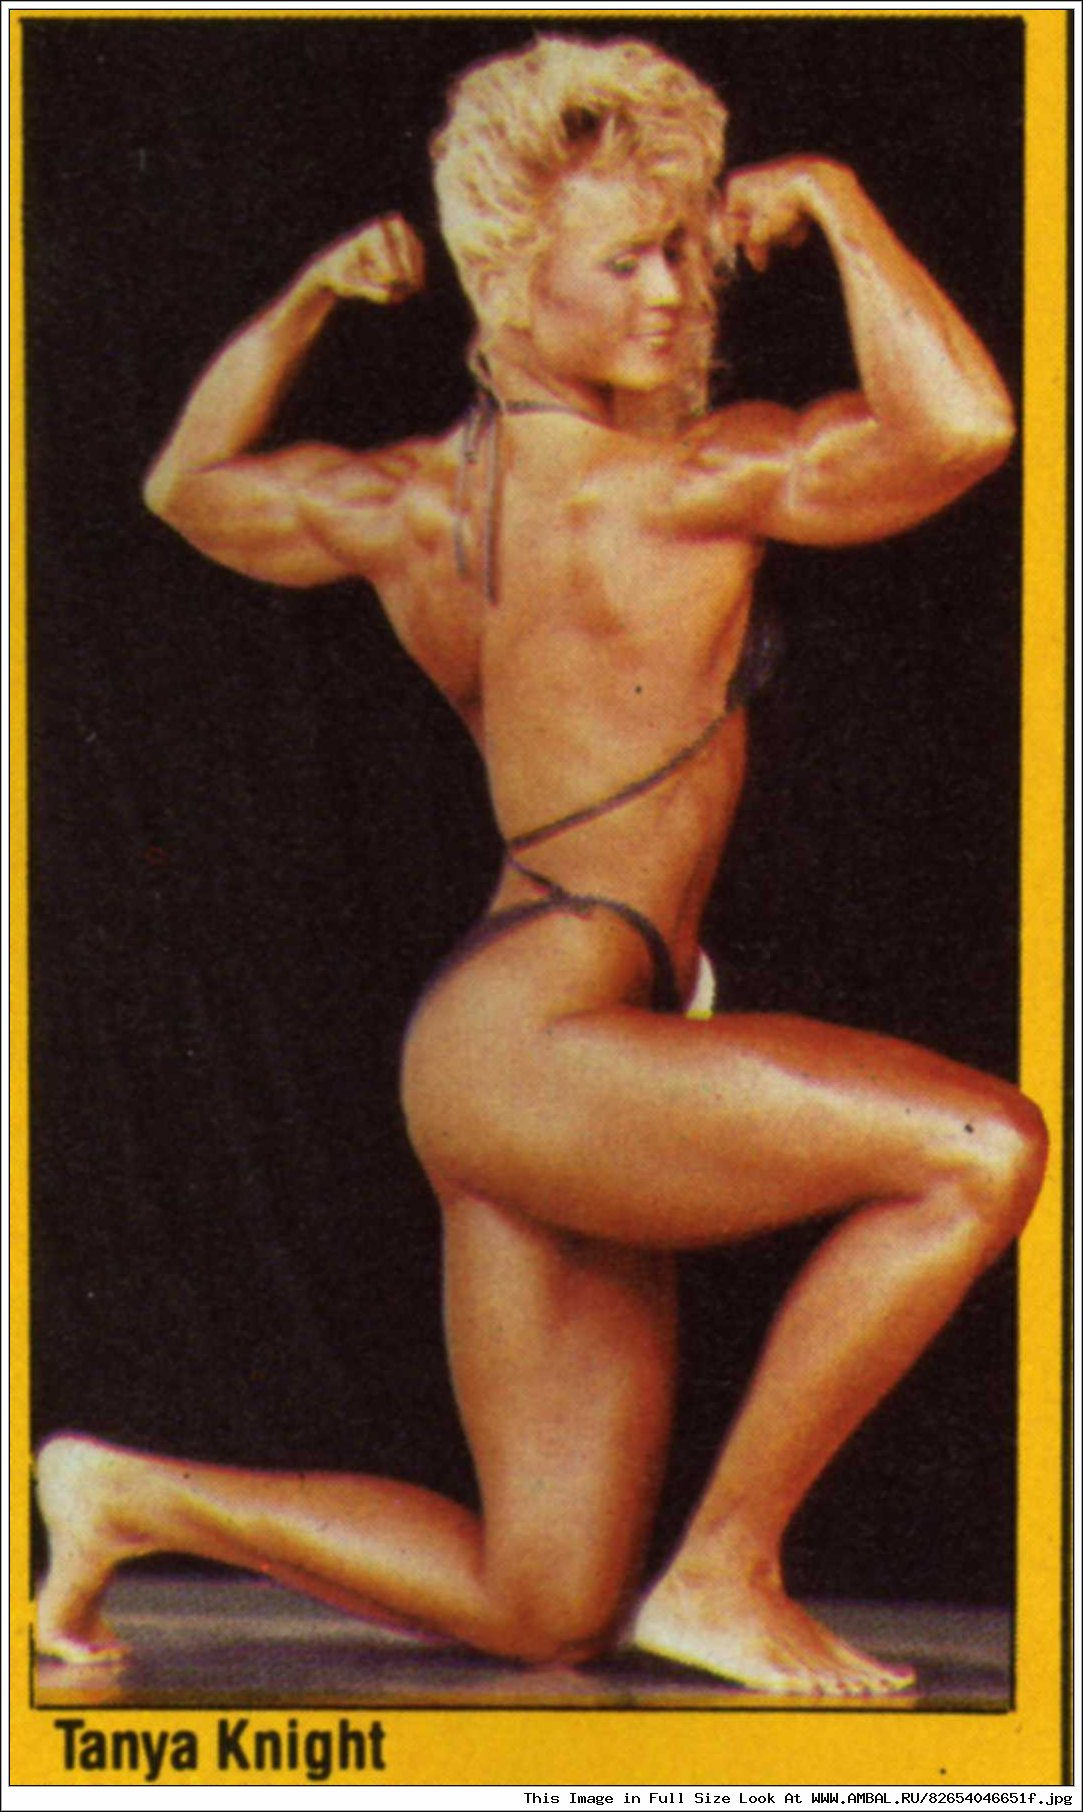 Tonya knight nude pics naked actress